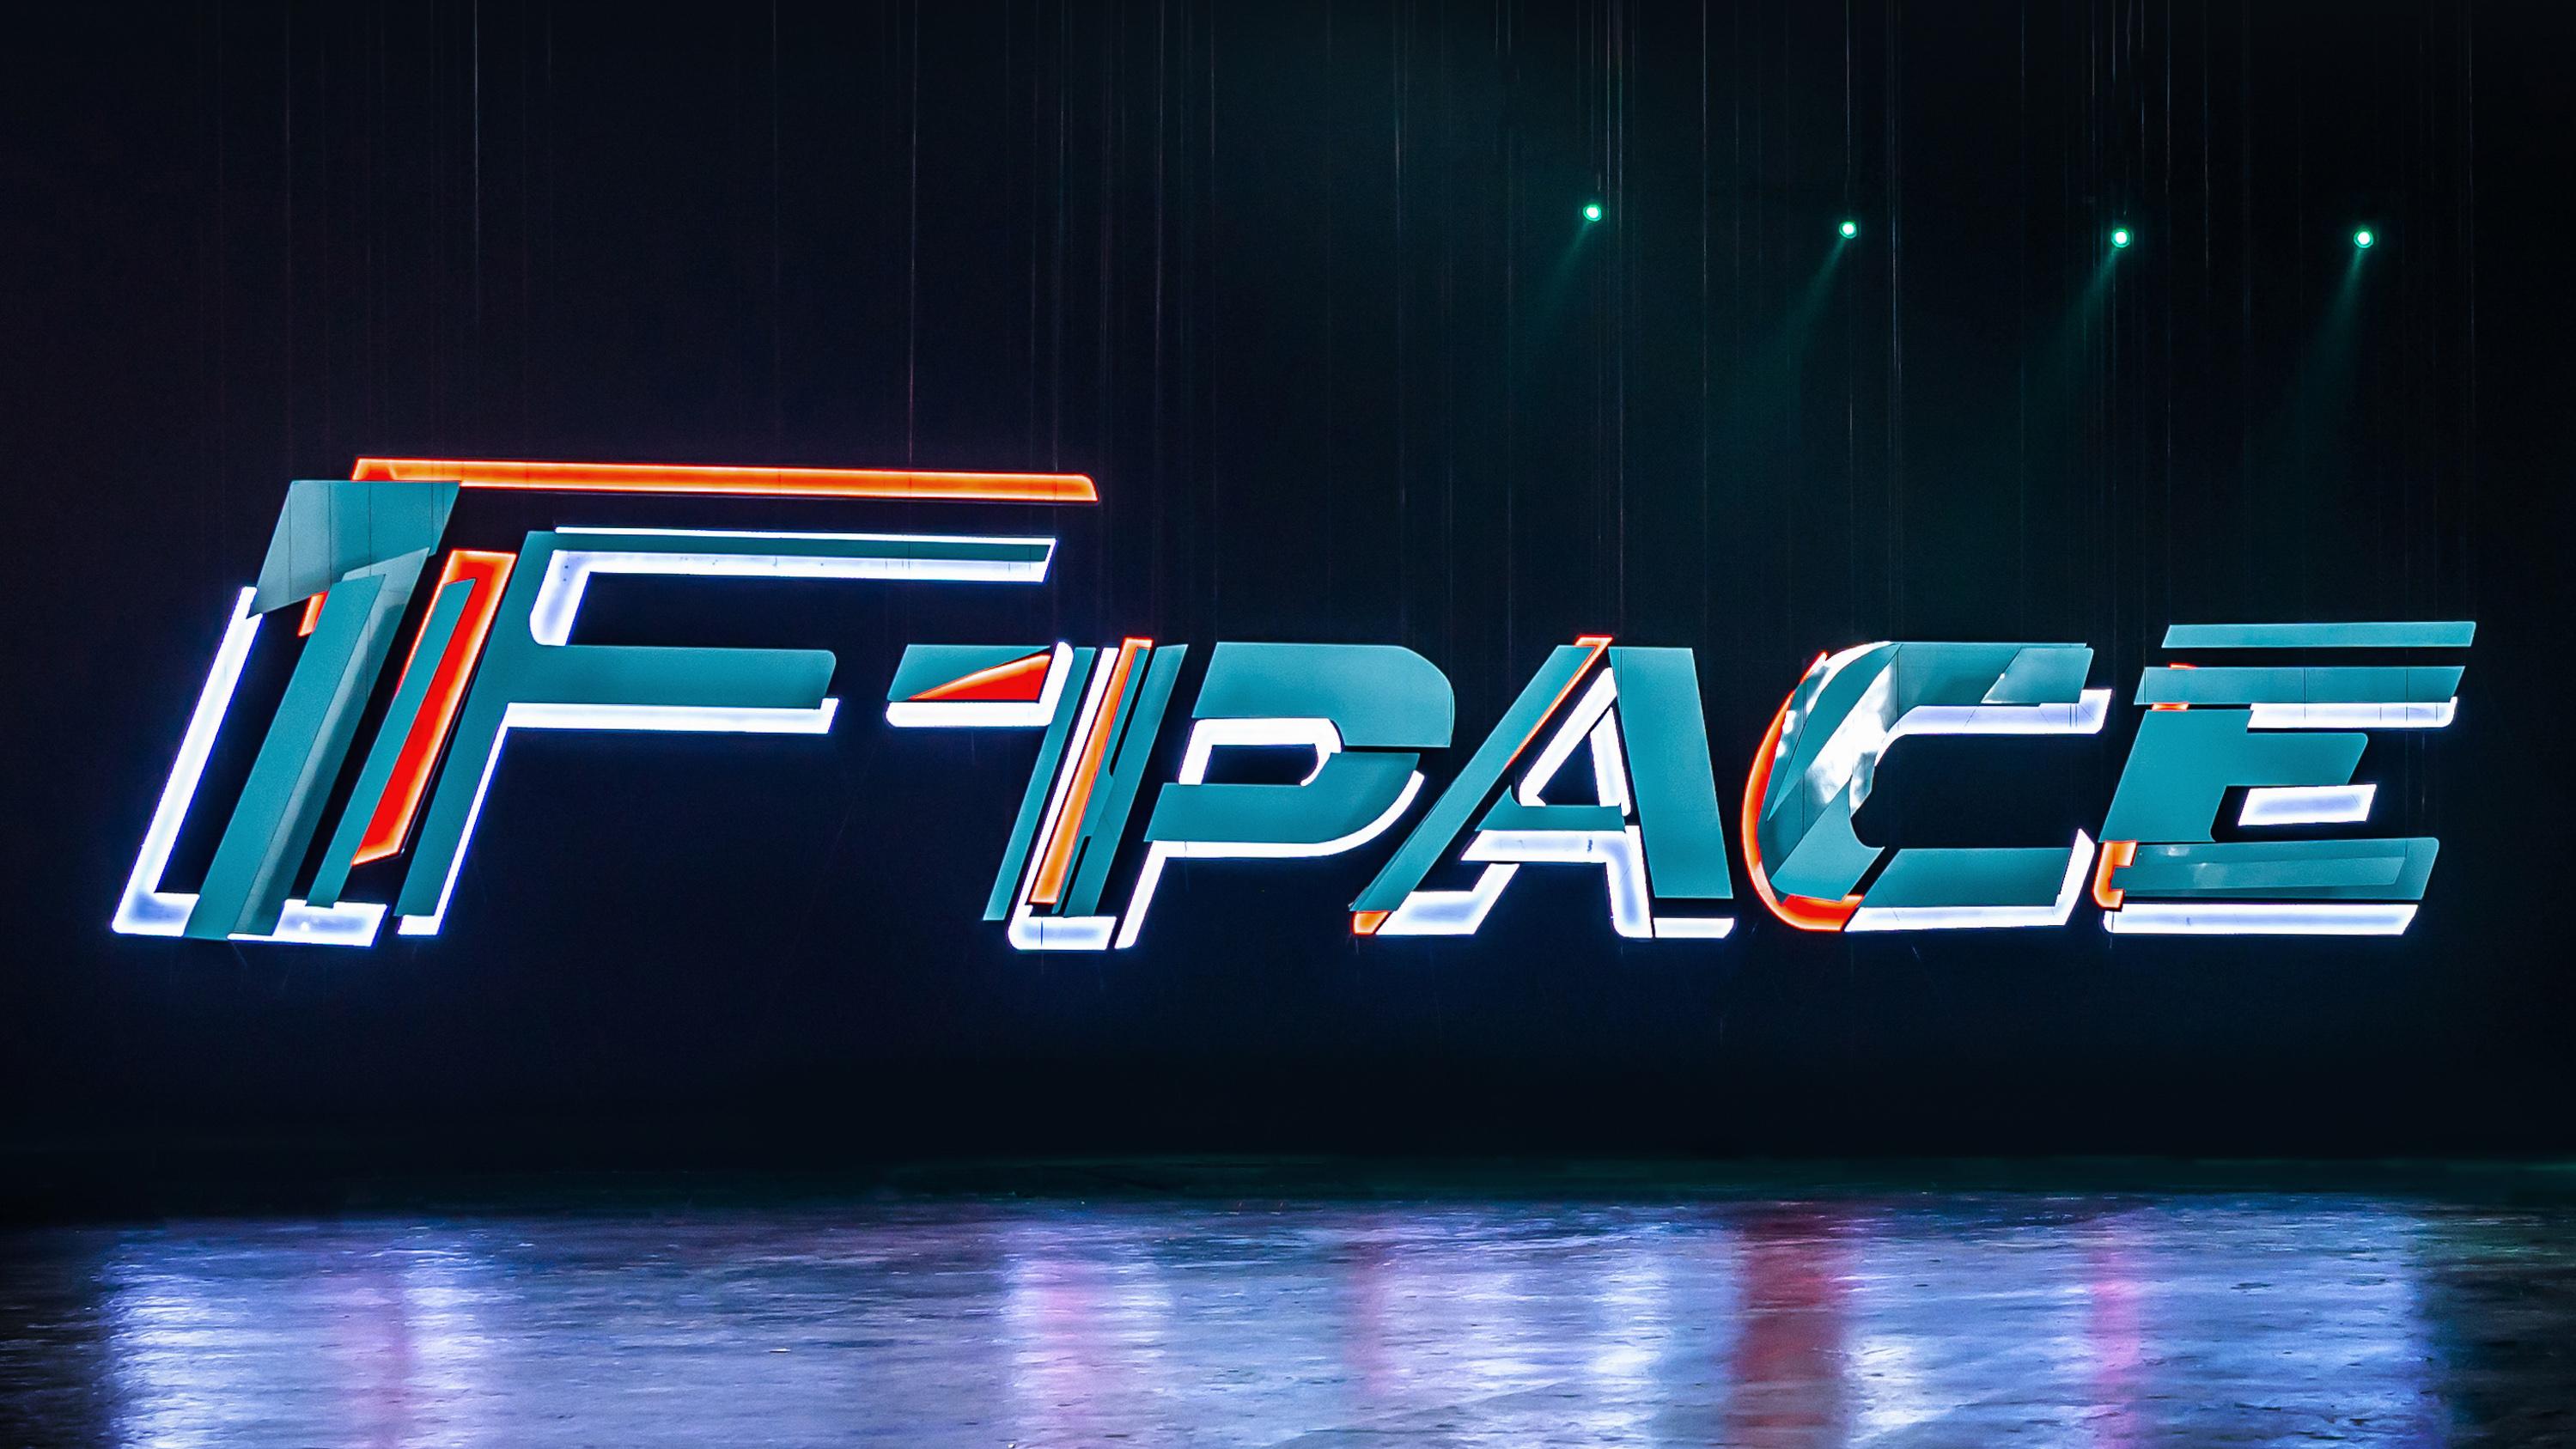 Jaguar 小改款 F-Pace 預告 7/19 正式登台!臉書官方粉絲團搶先預告